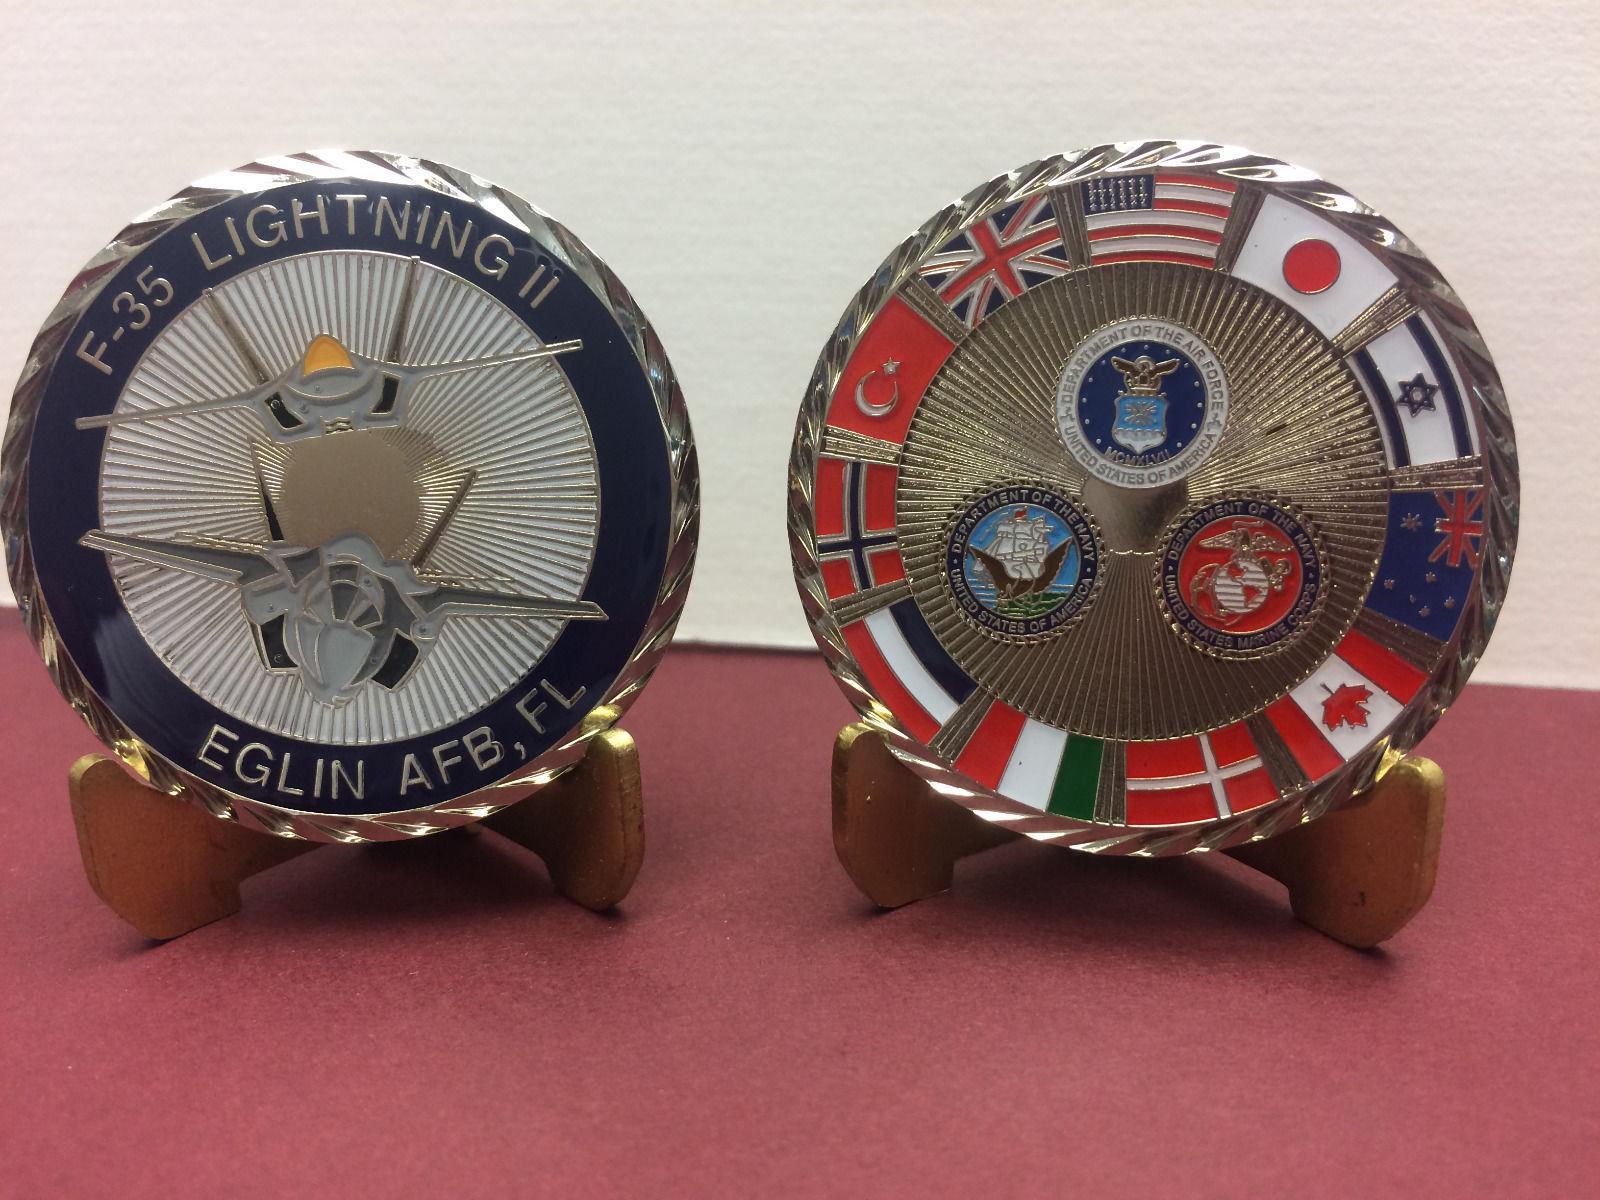 Eglin AFB F-35 Challenge Coin